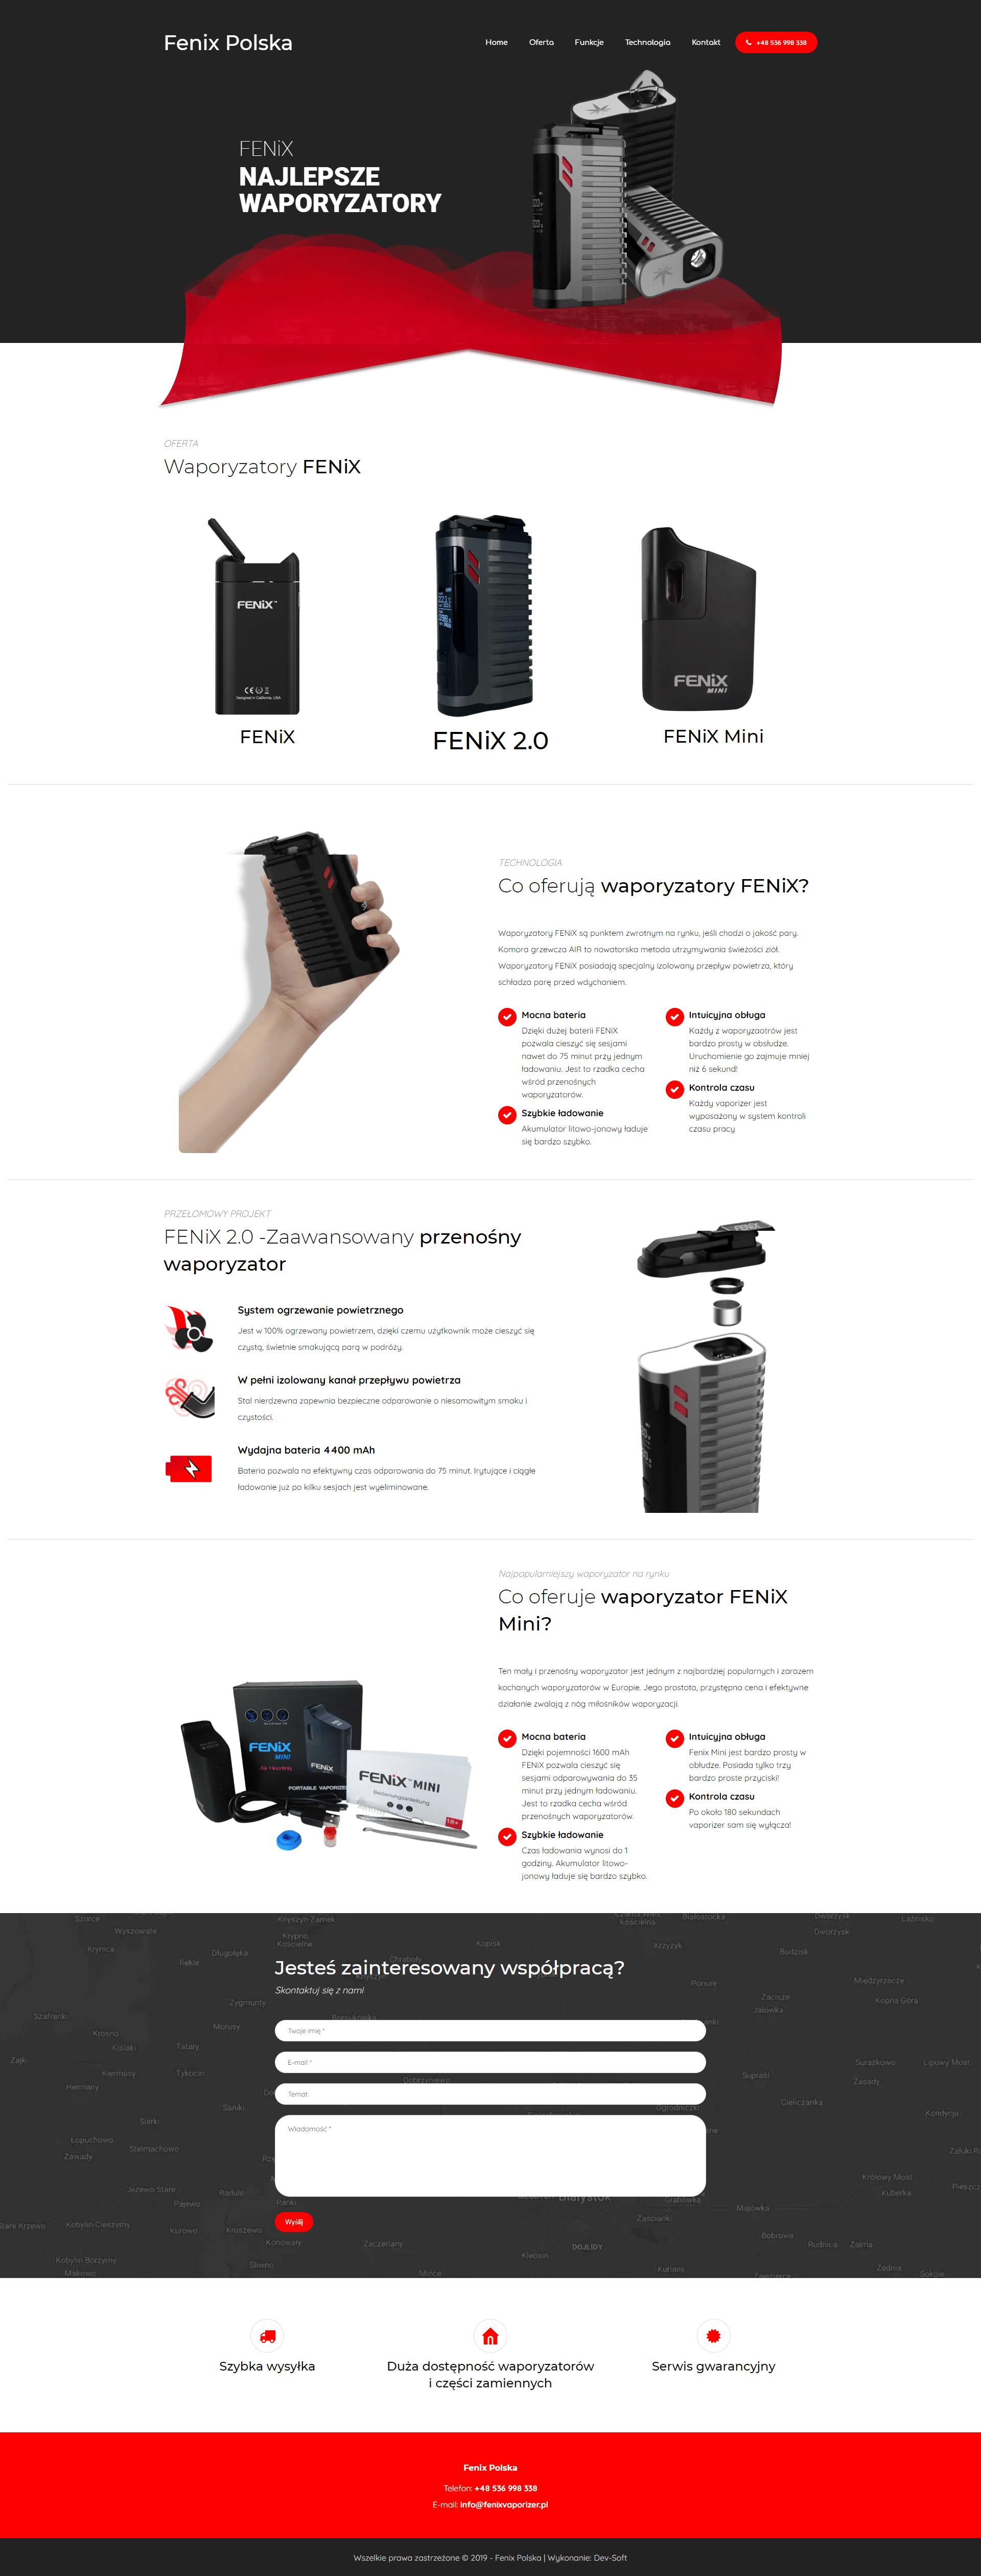 fenix-polska-homepage